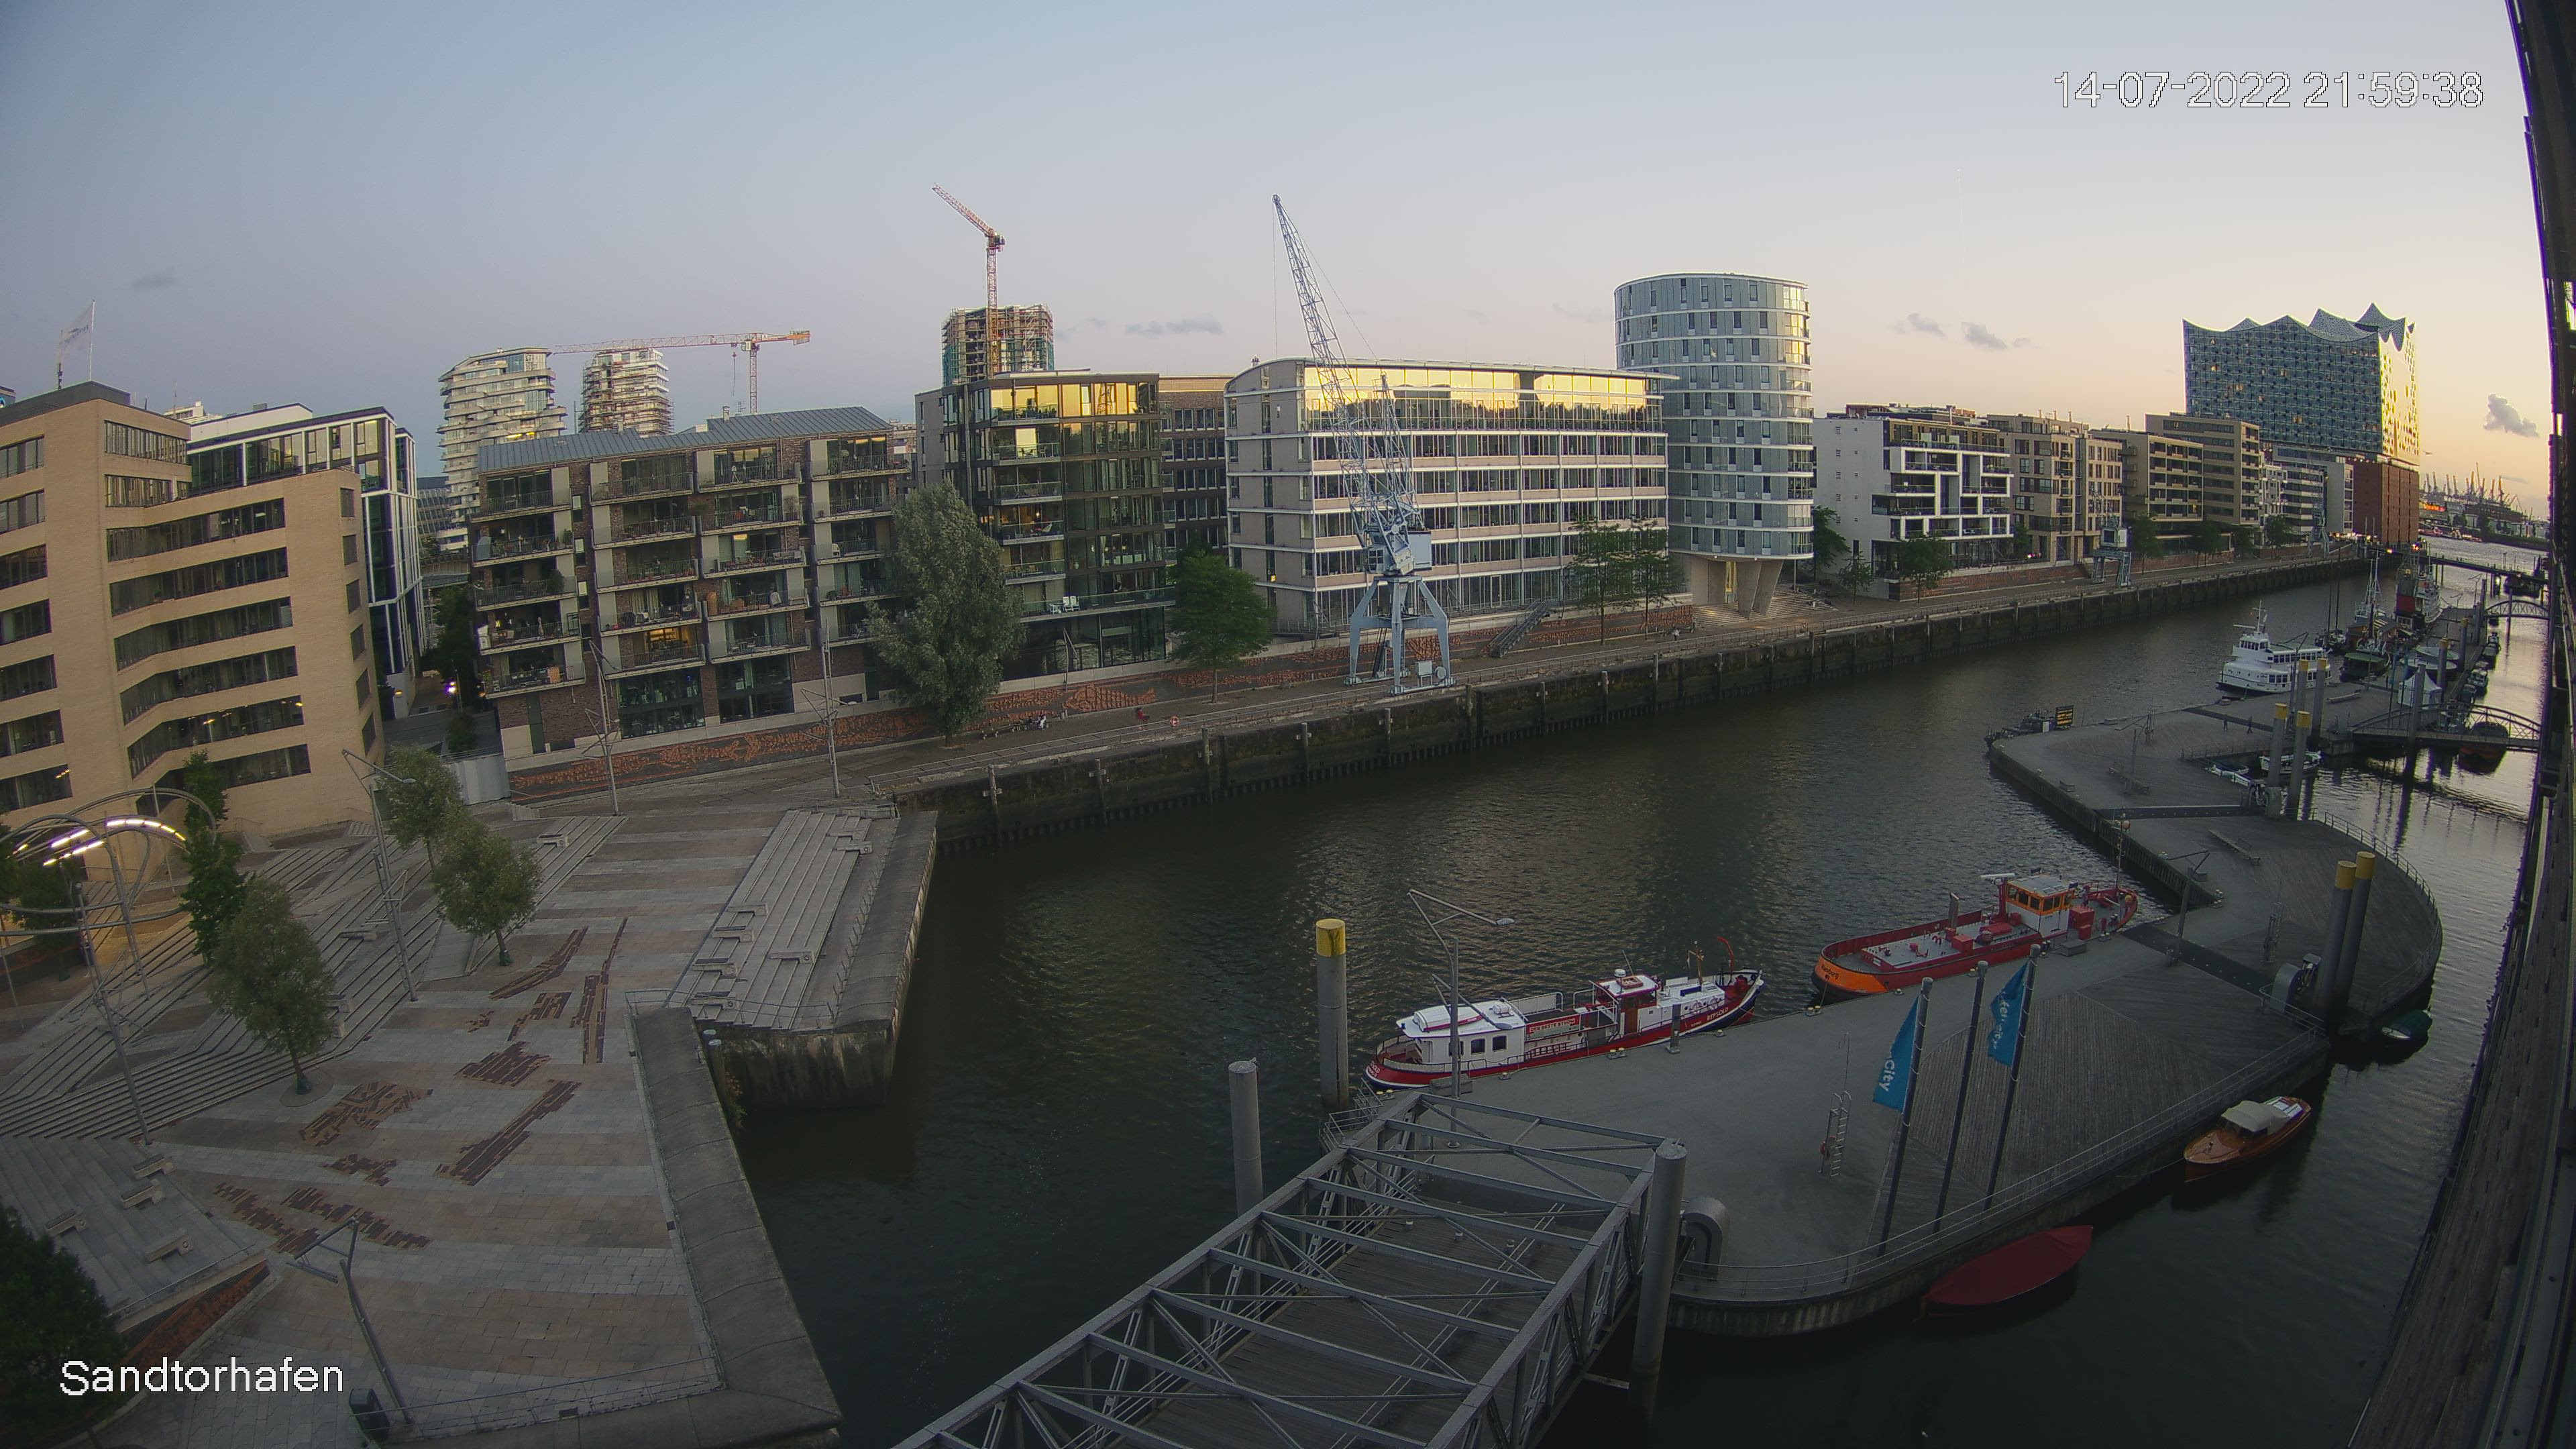 Hamburg: Sandtorhafen